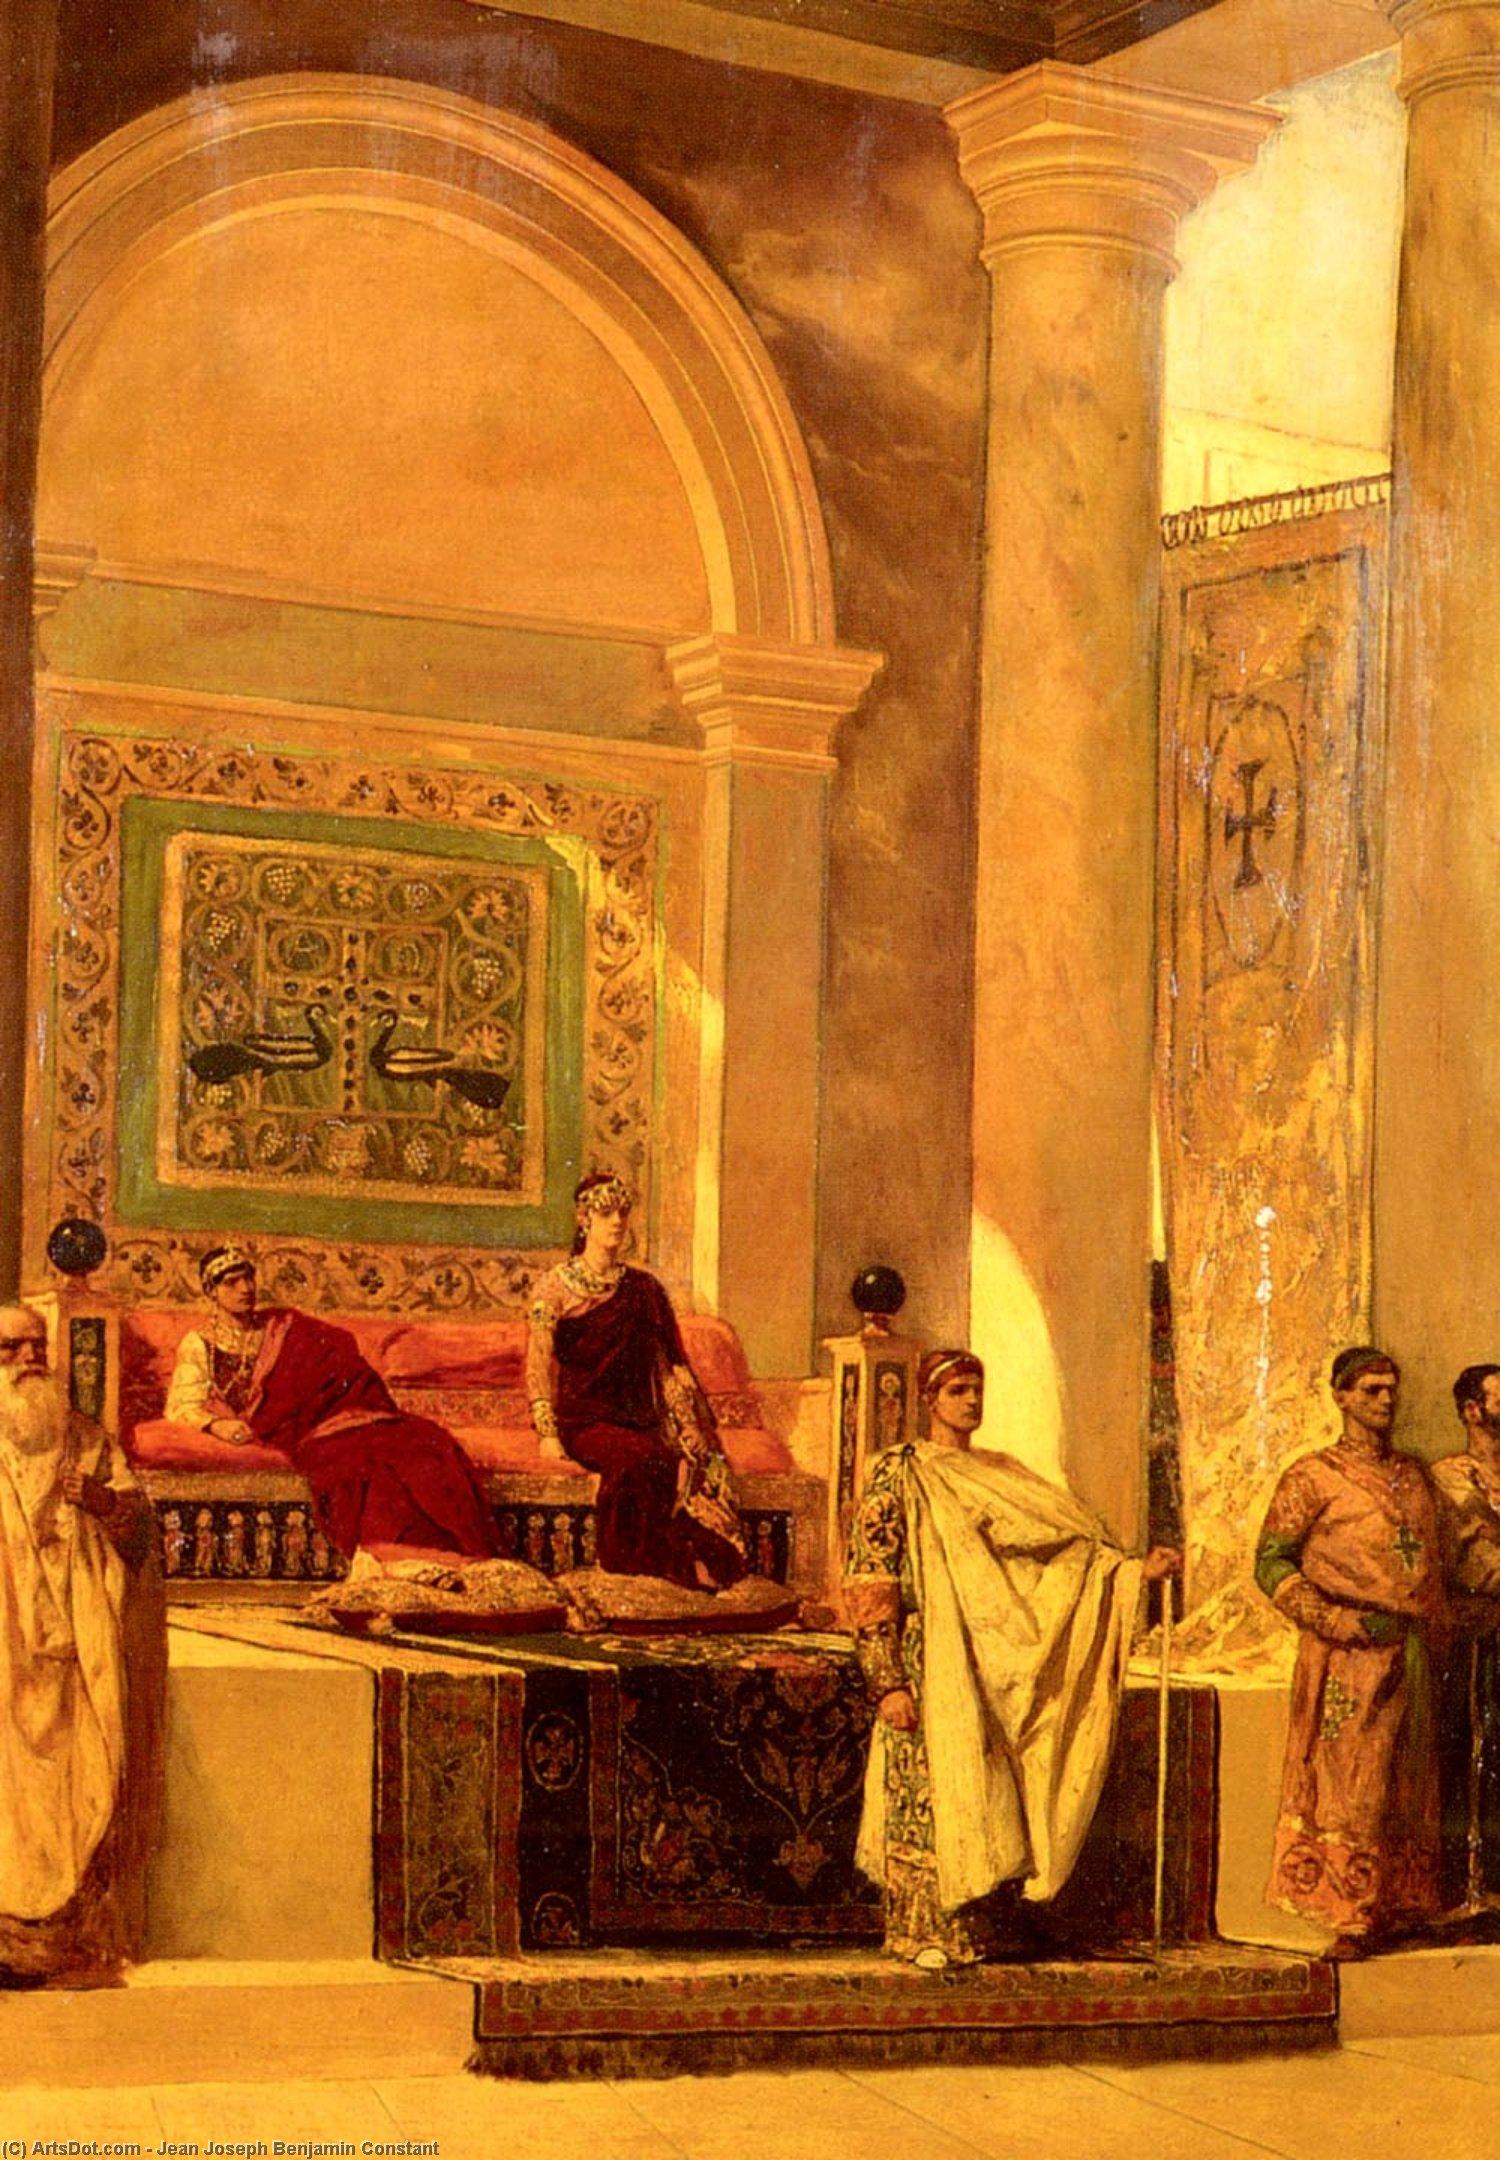 Тронный зал в Византии - Jean Joseph Benjamin Constant